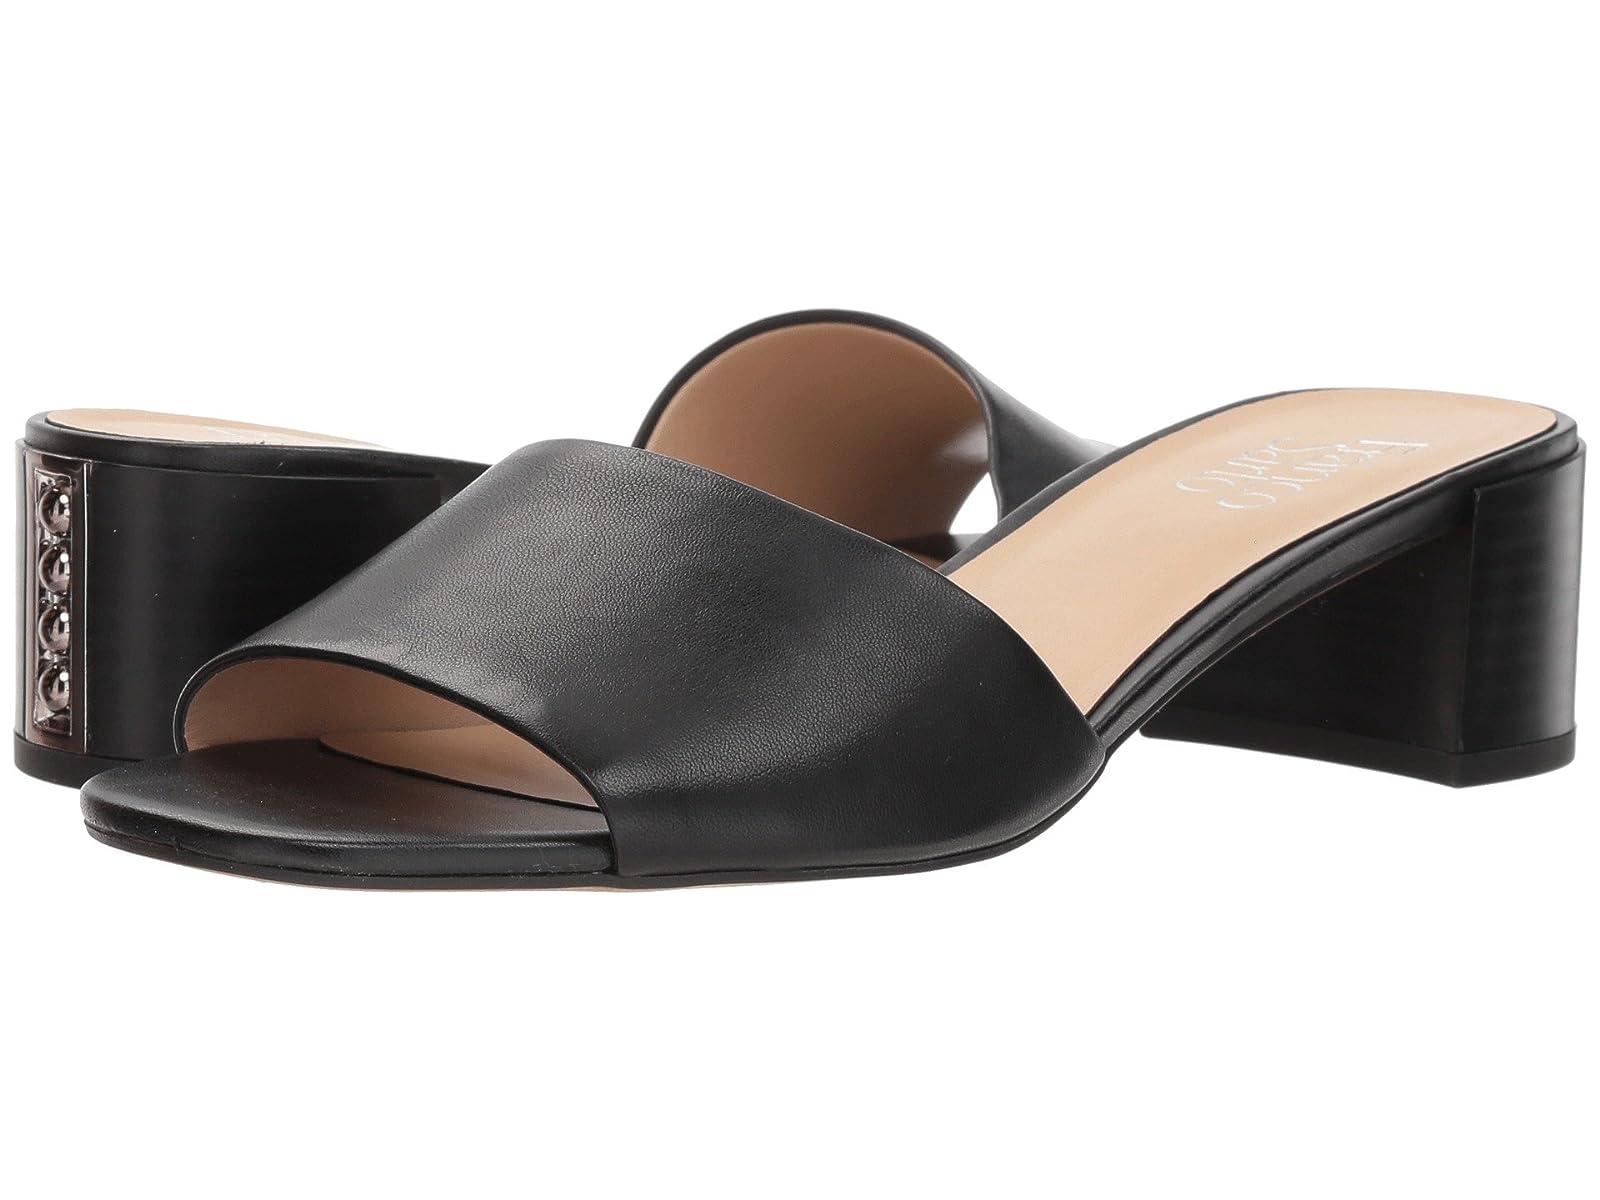 Franco Sarto RamyAtmospheric grades have affordable shoes